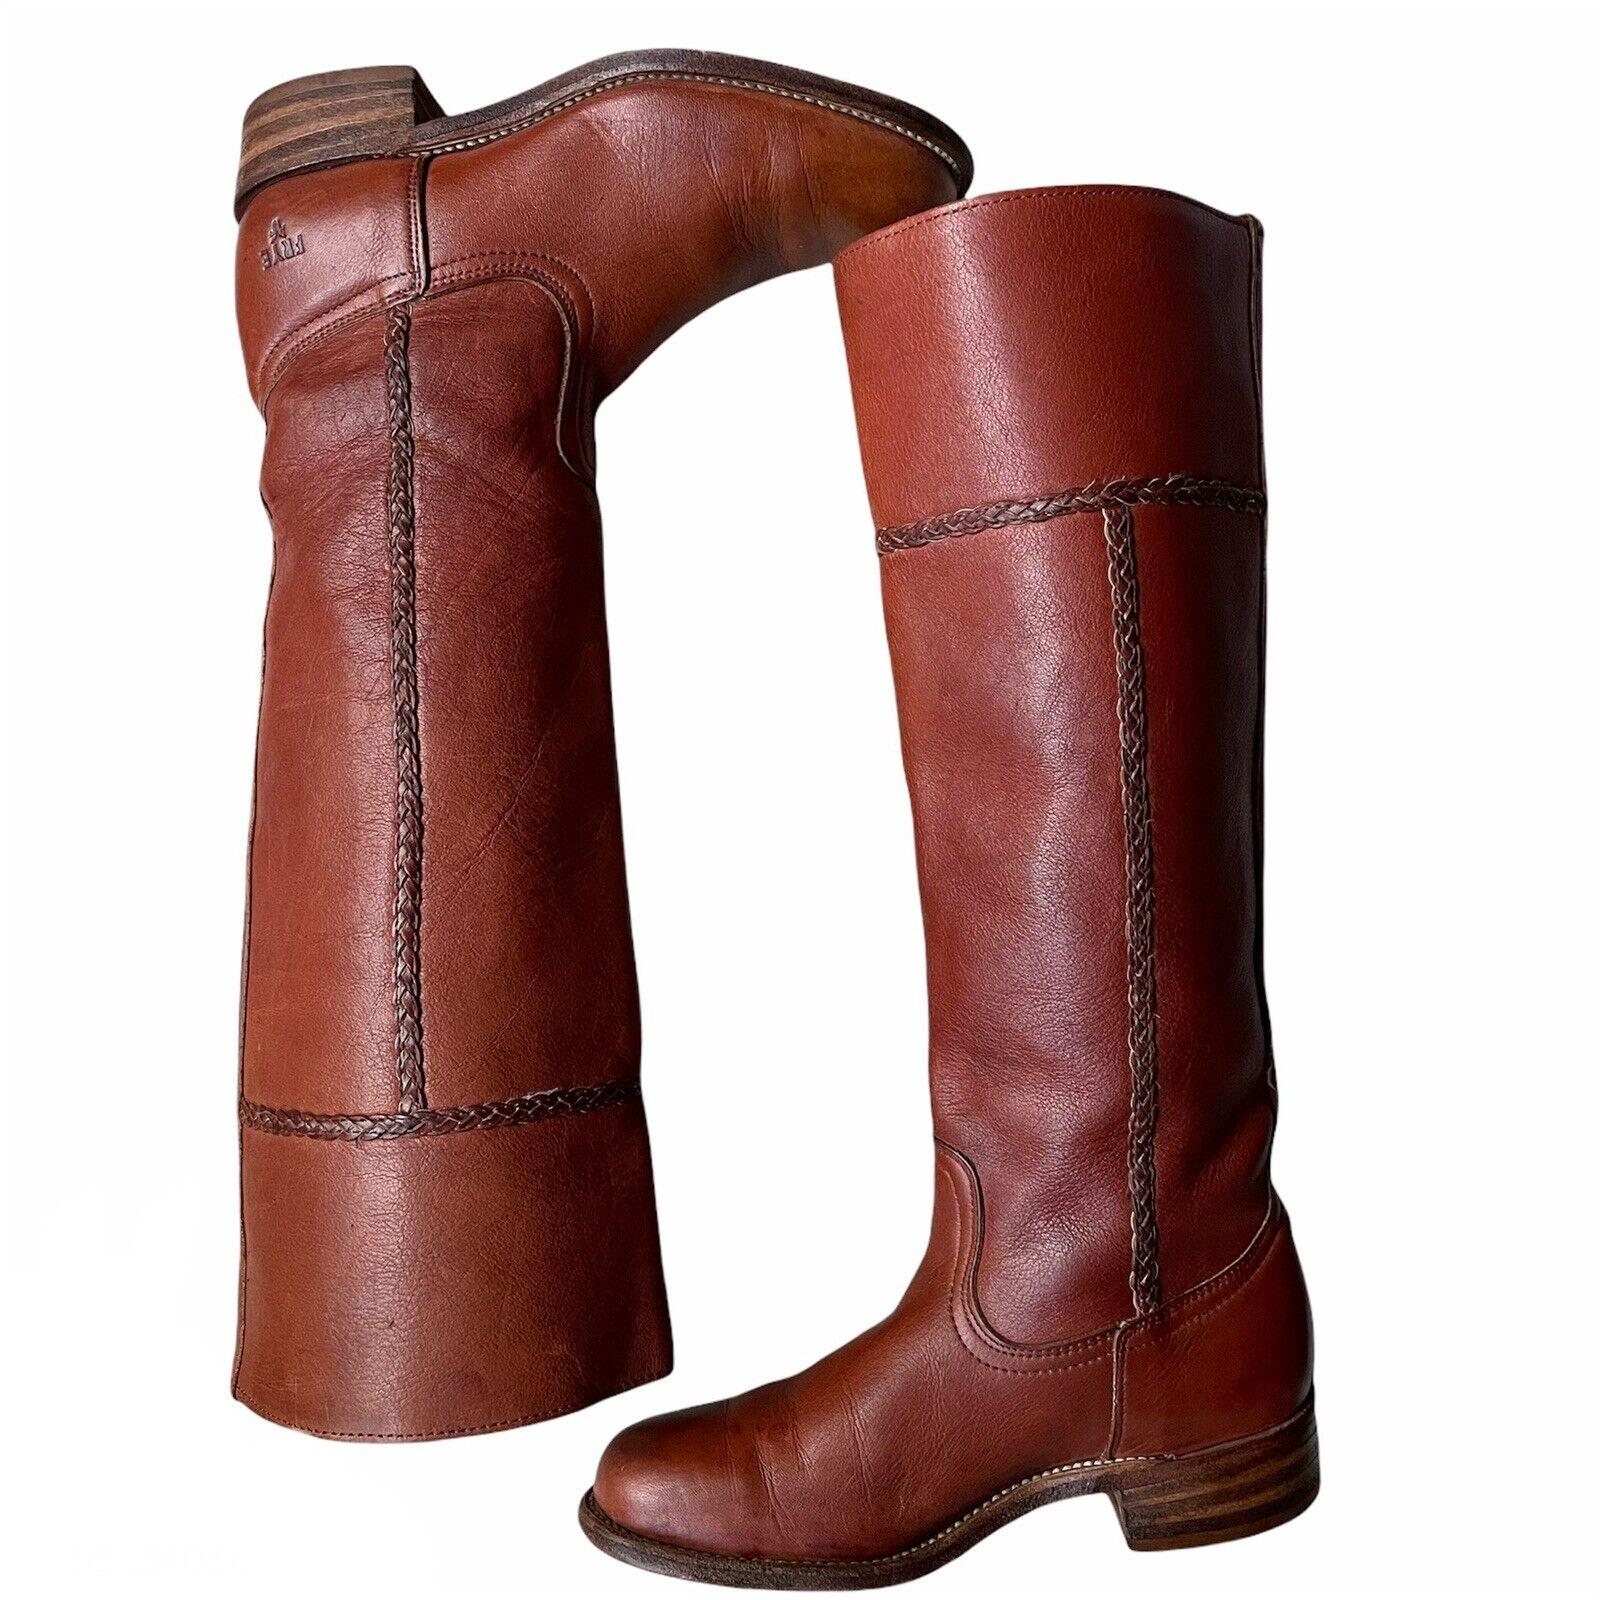 Frye Vintage Cognac Brown Leather Saddle Campus Braid Boots. Women's 5.5